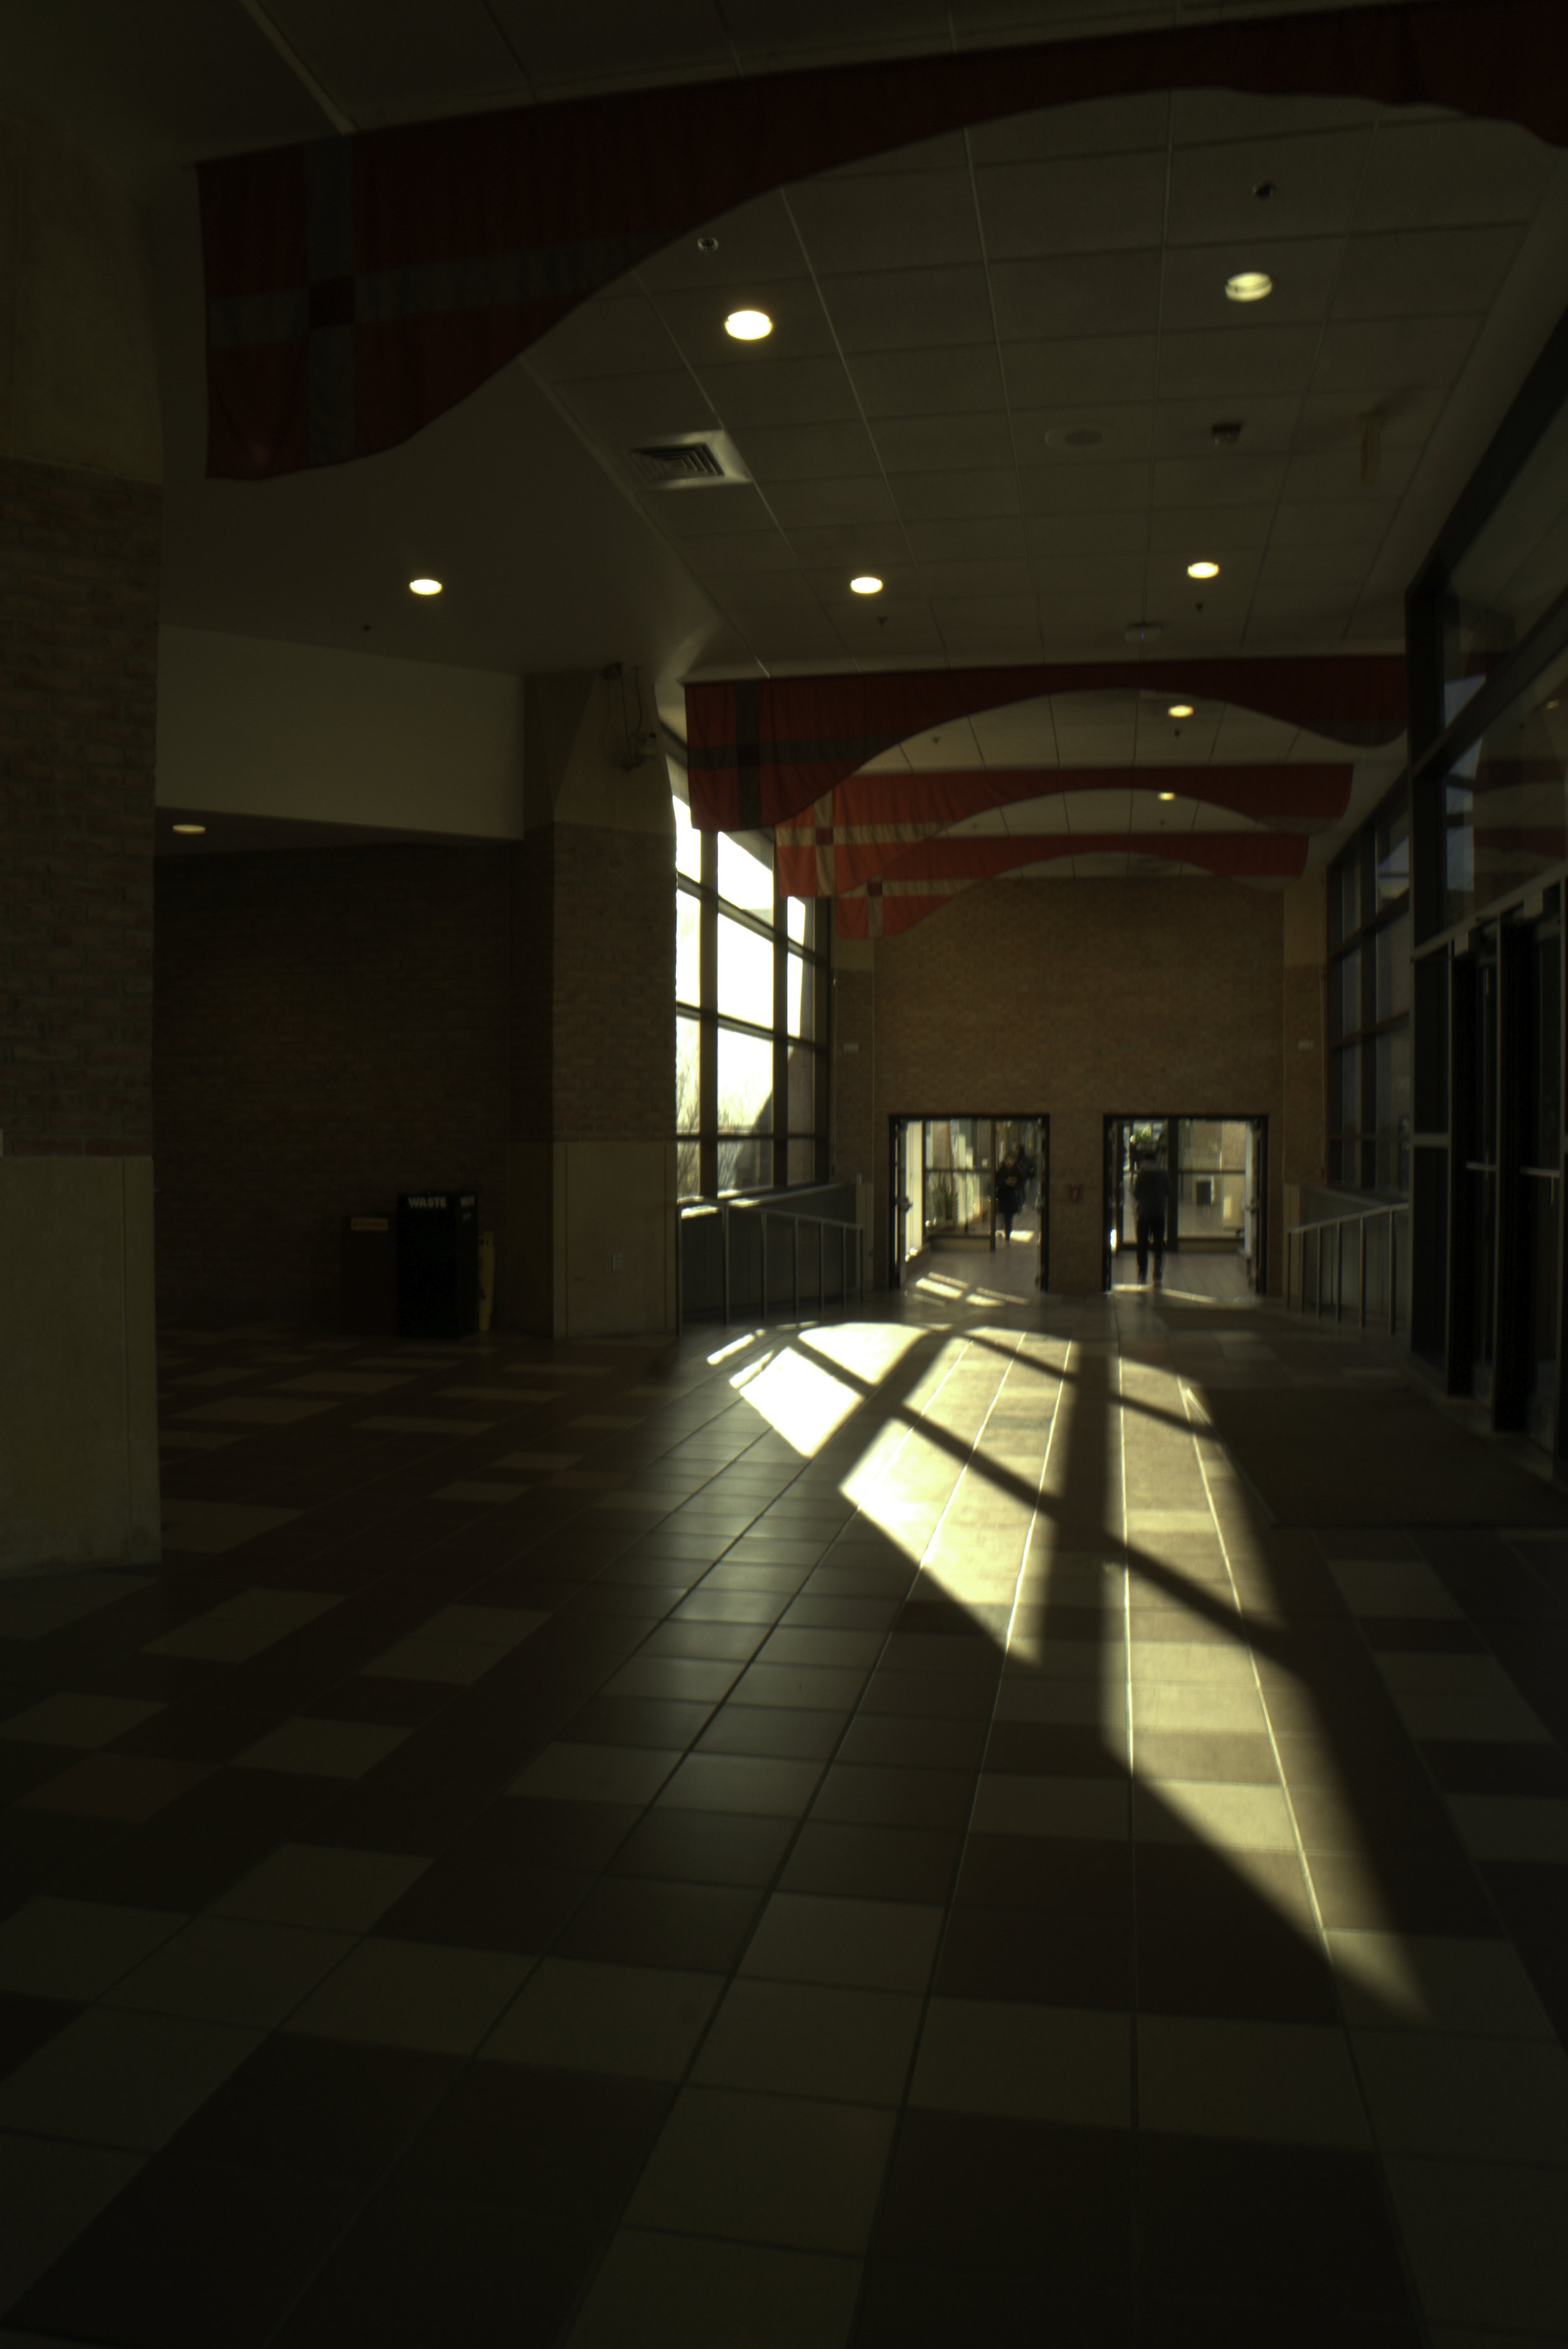 Perfect-illusion-lights-Ann-Arbor-Michigan.jpg